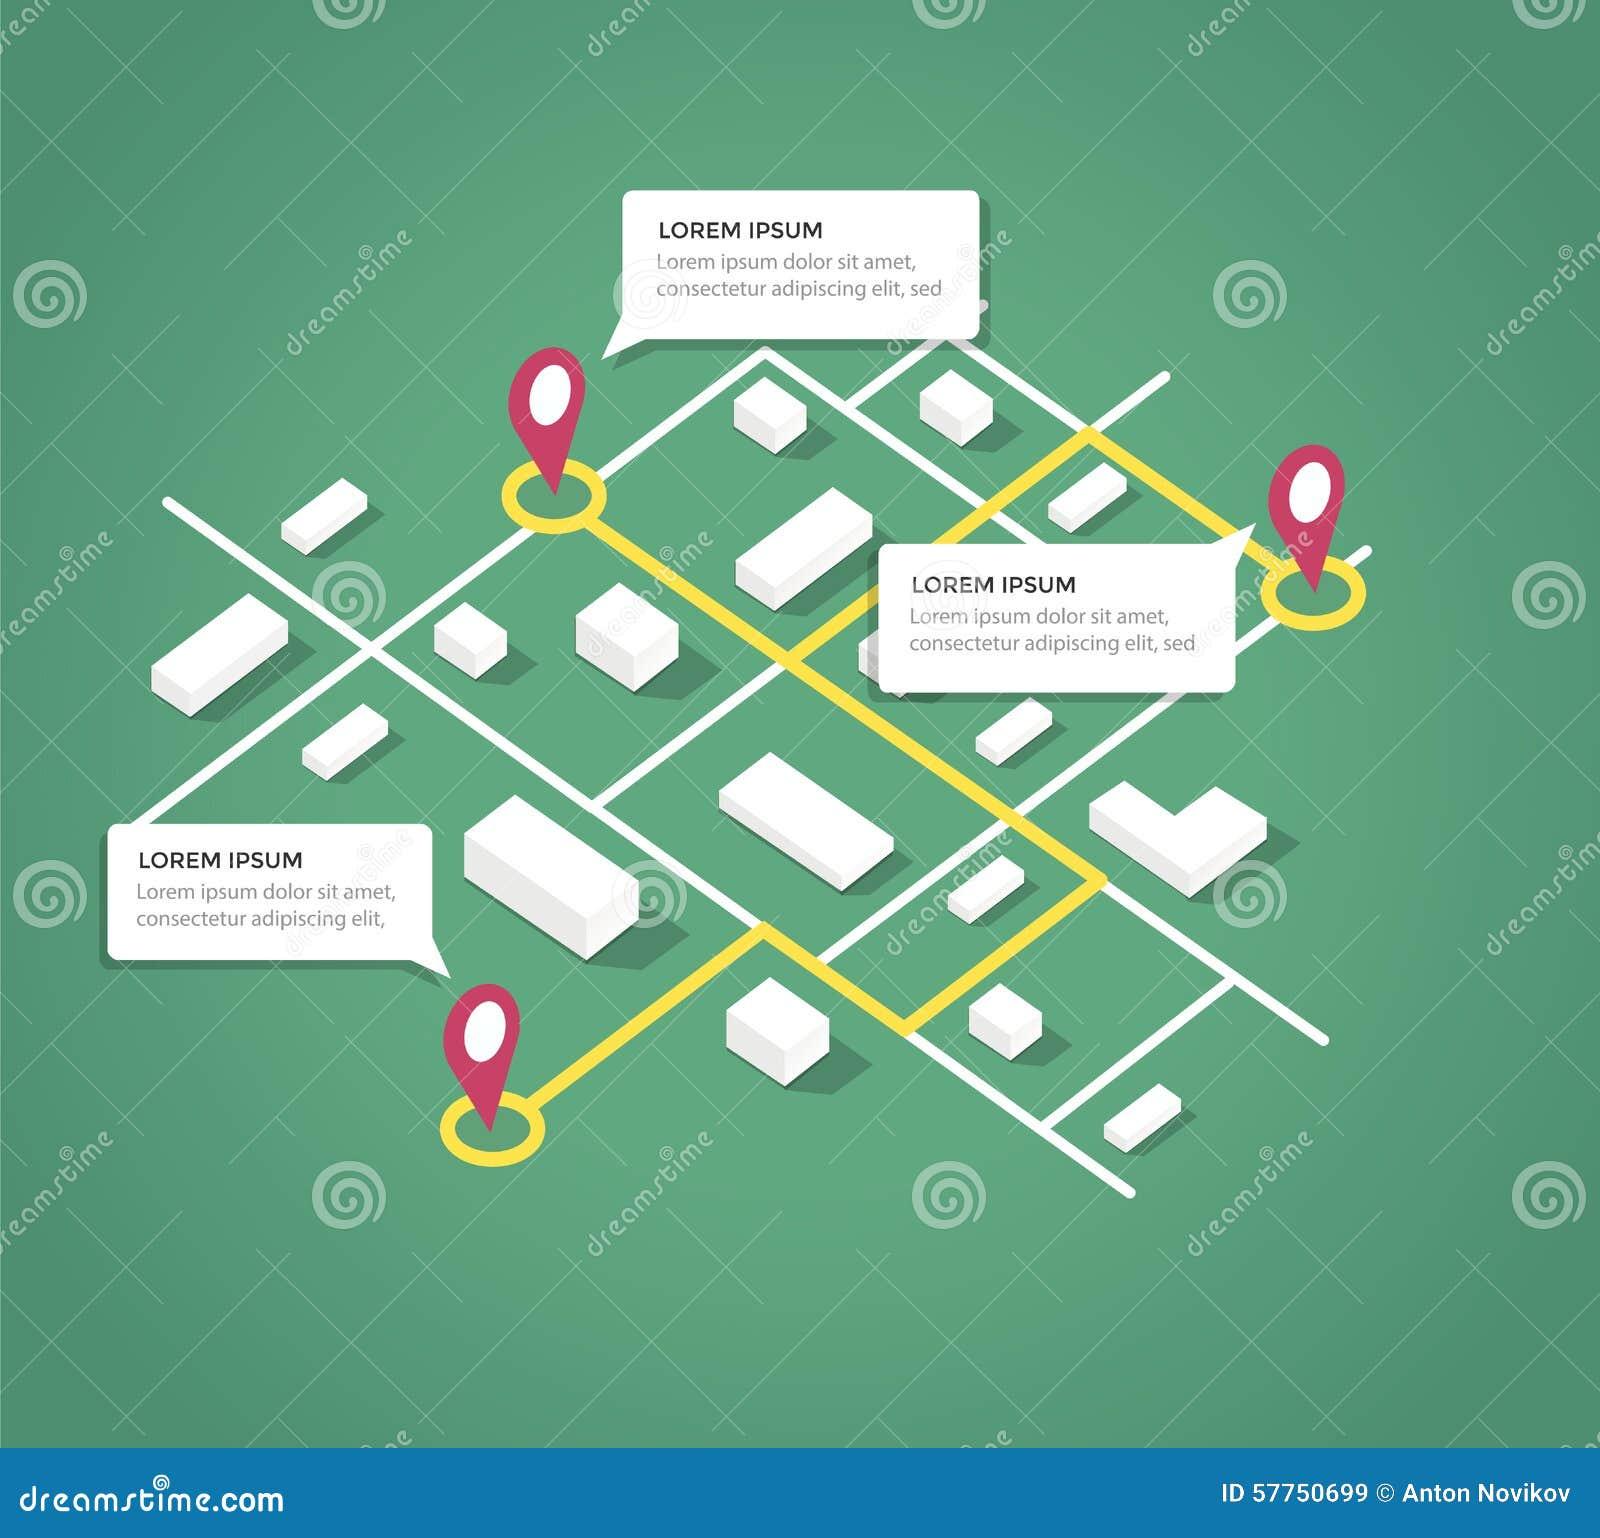 Isometric City Map Design Elements Stock Vector - Image: 57750699